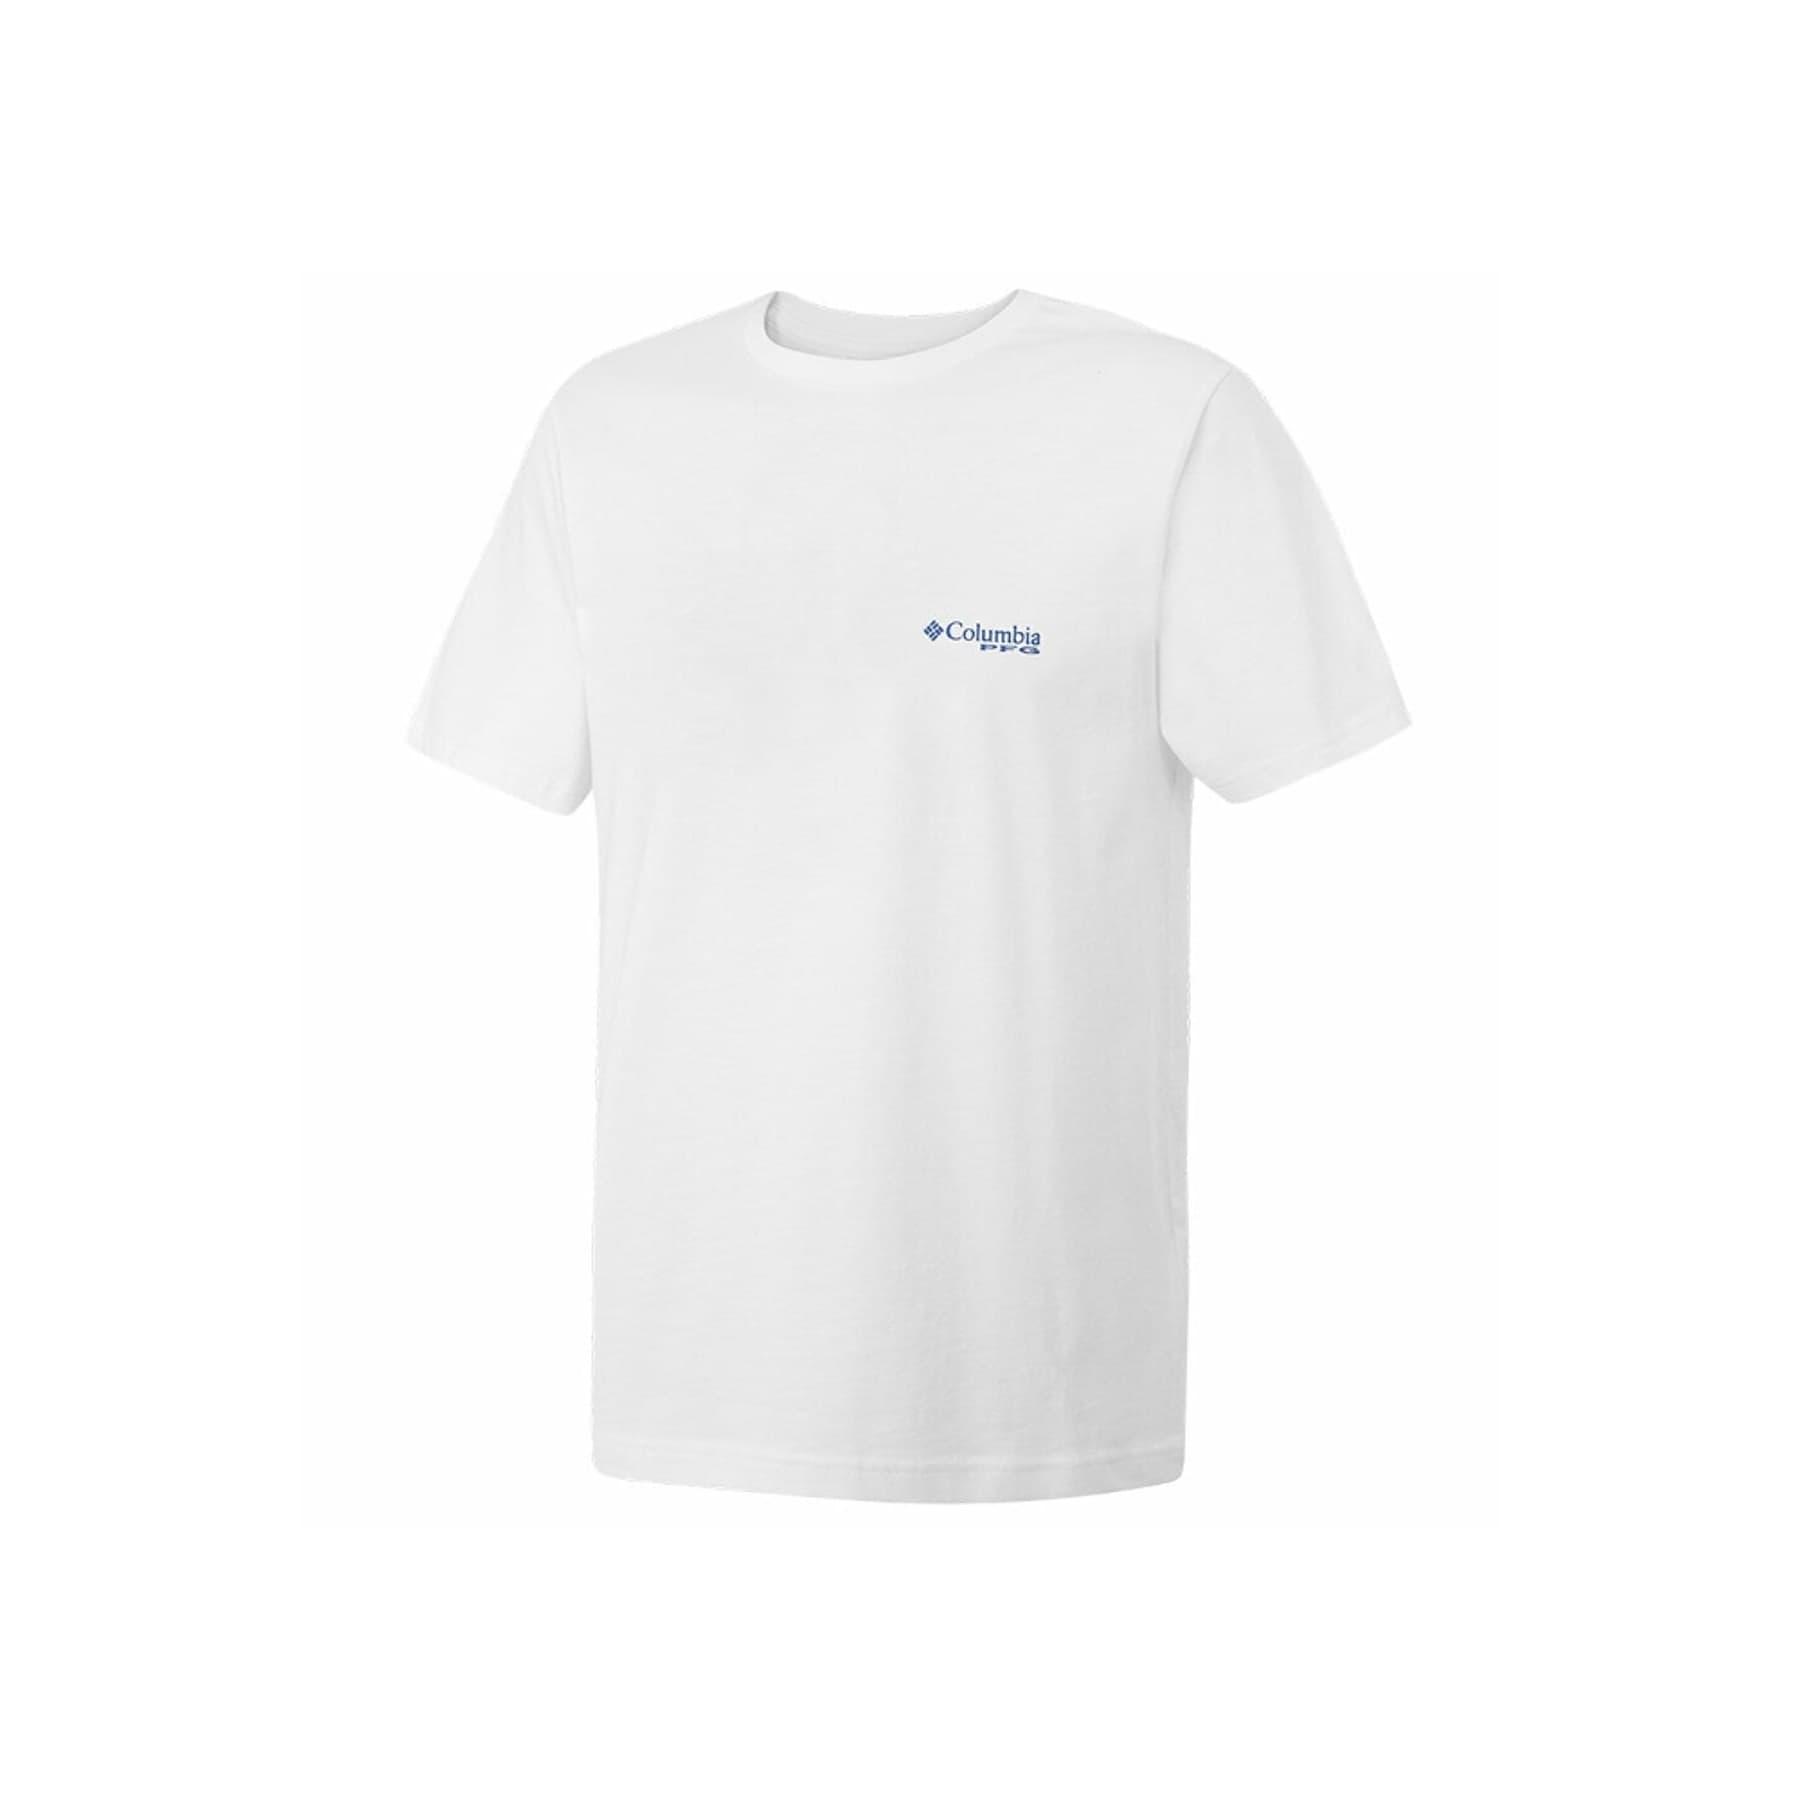 PFG Elements Marlin Erkek Beyaz Tişört